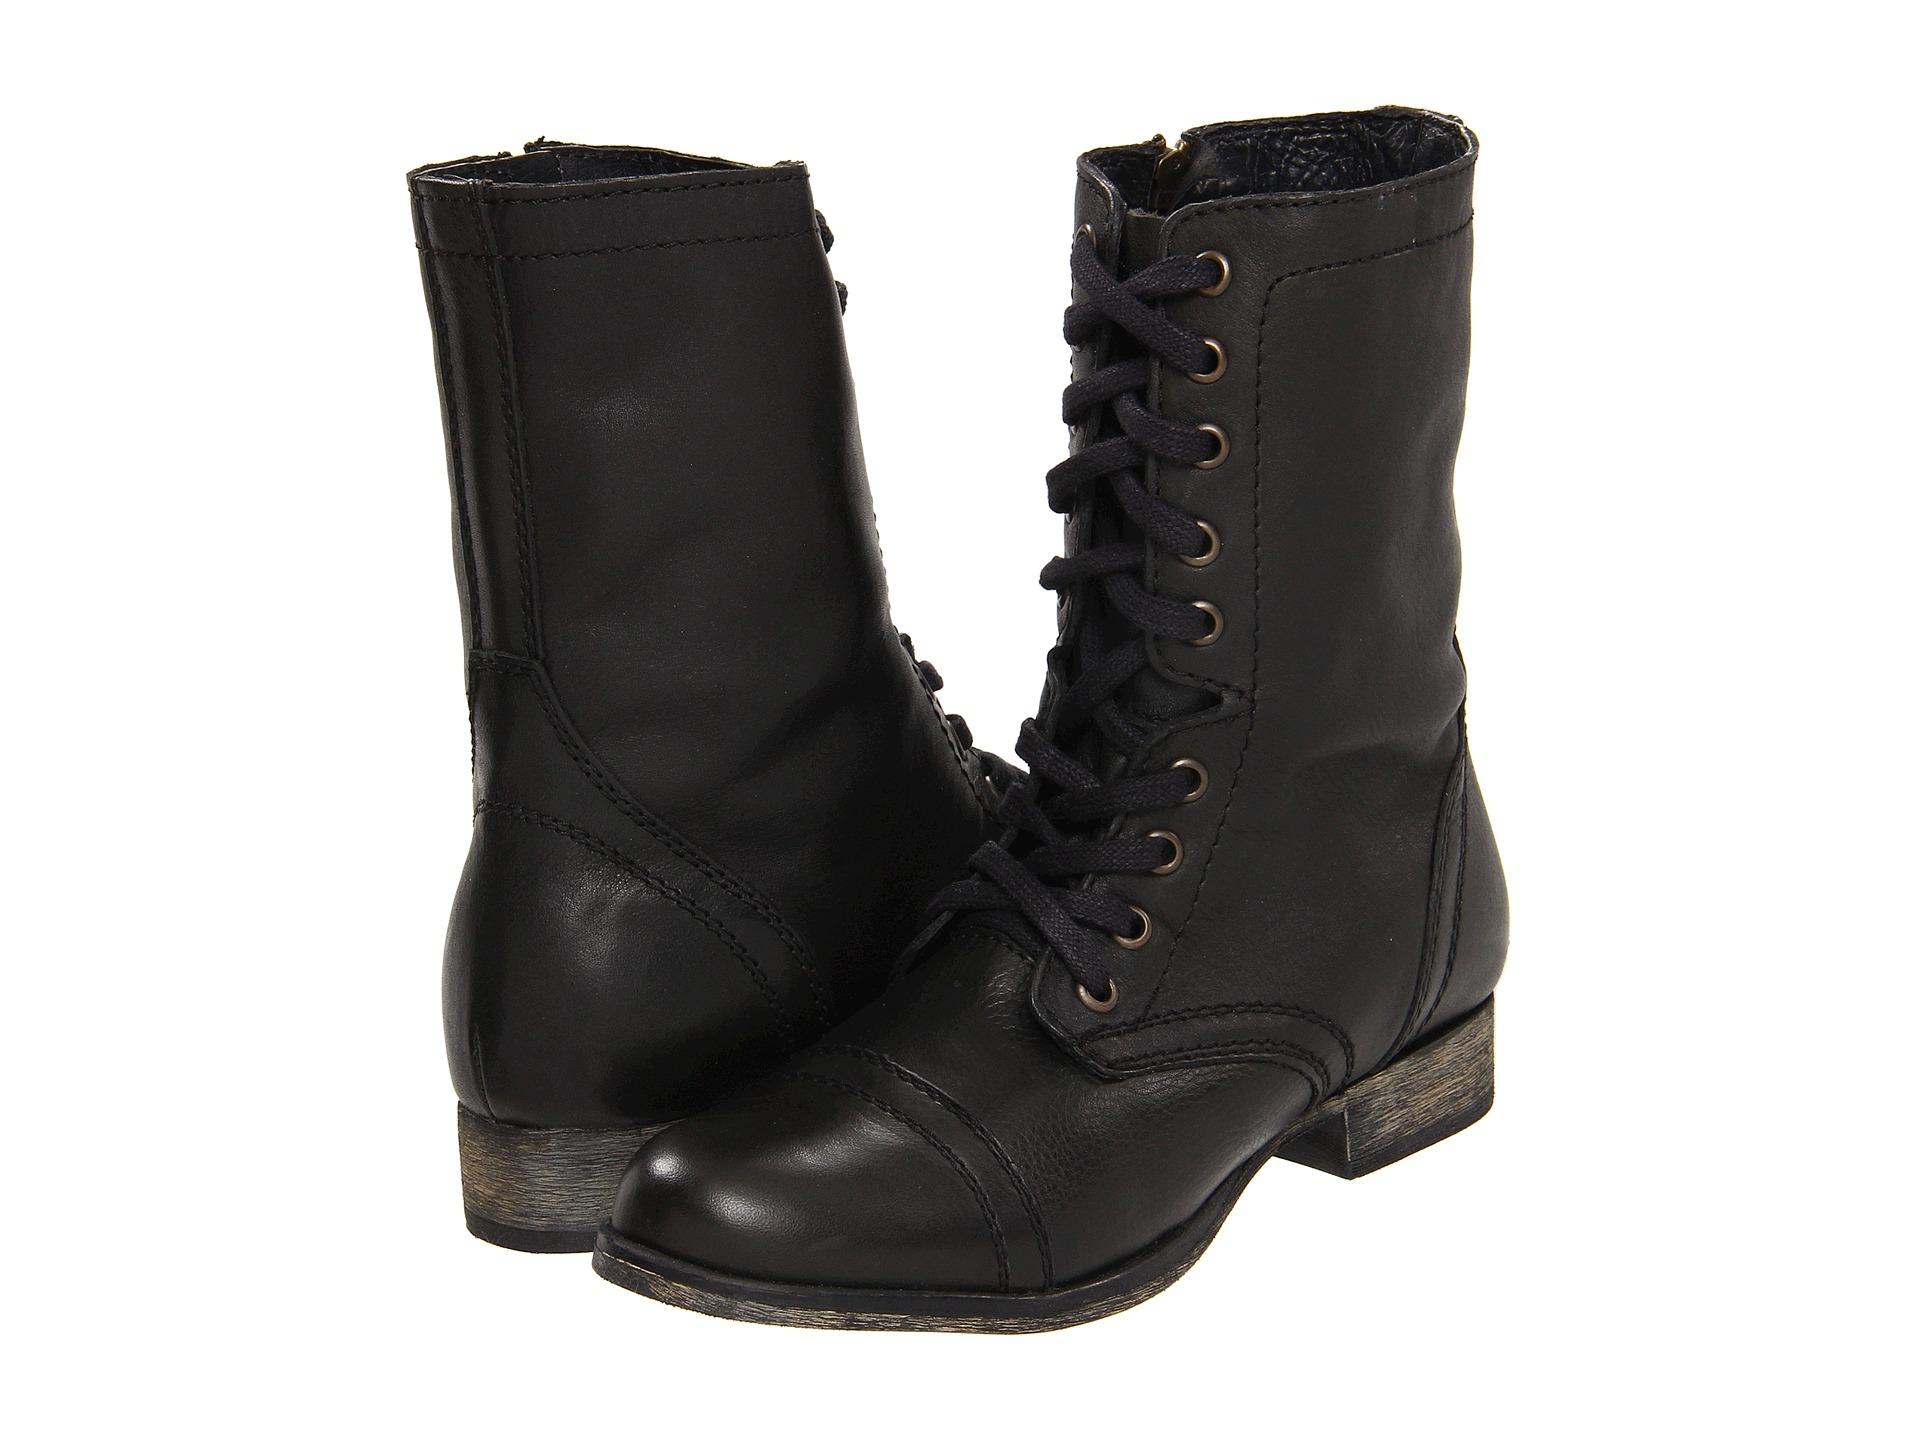 22 Popular Black Lace Up Boots For Women Sobatapkcom